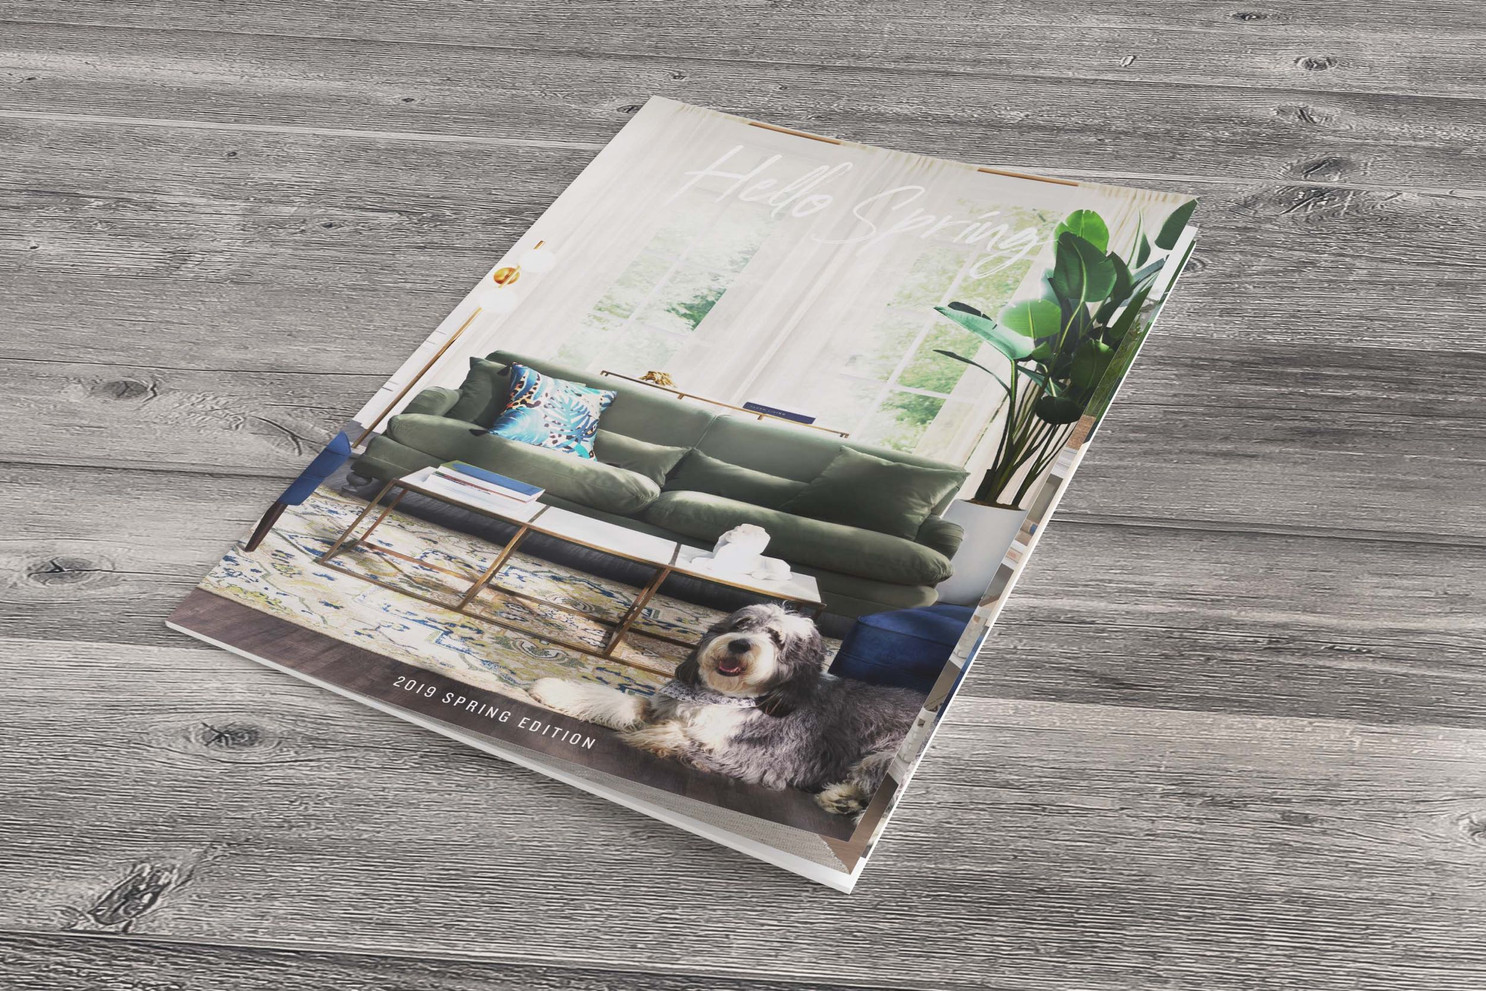 ASI/VCF Spring Lookbook Cover